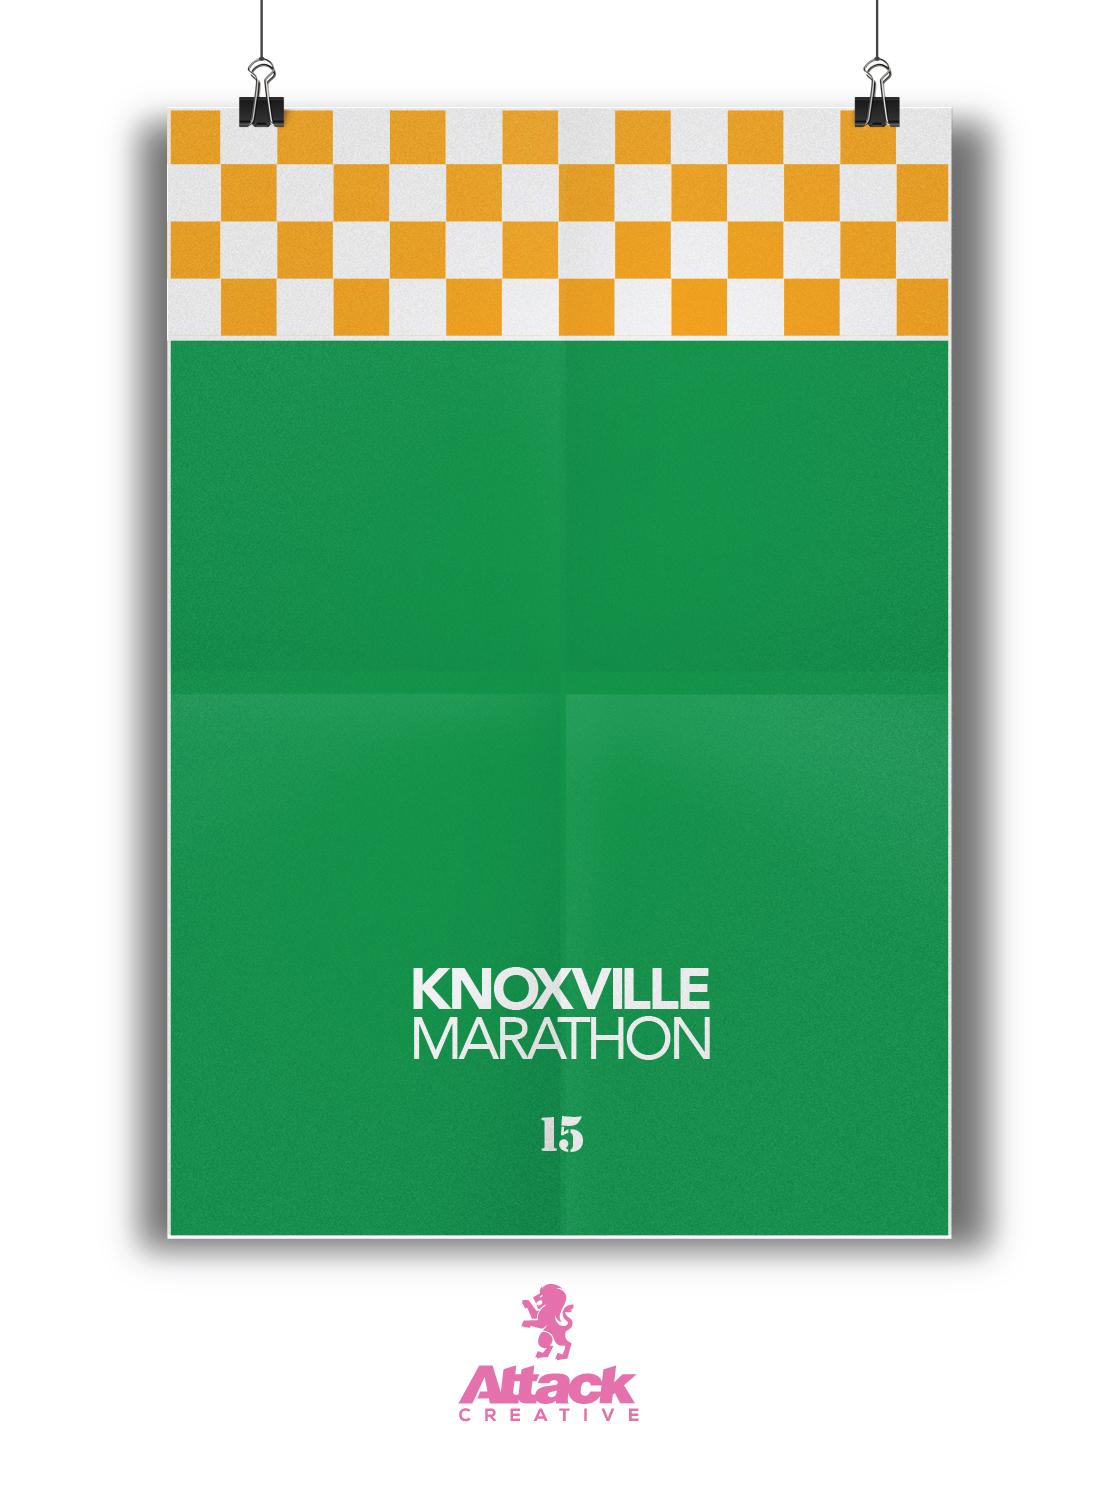 Knoxville-Marathon-Poster-mockup copy.jpg